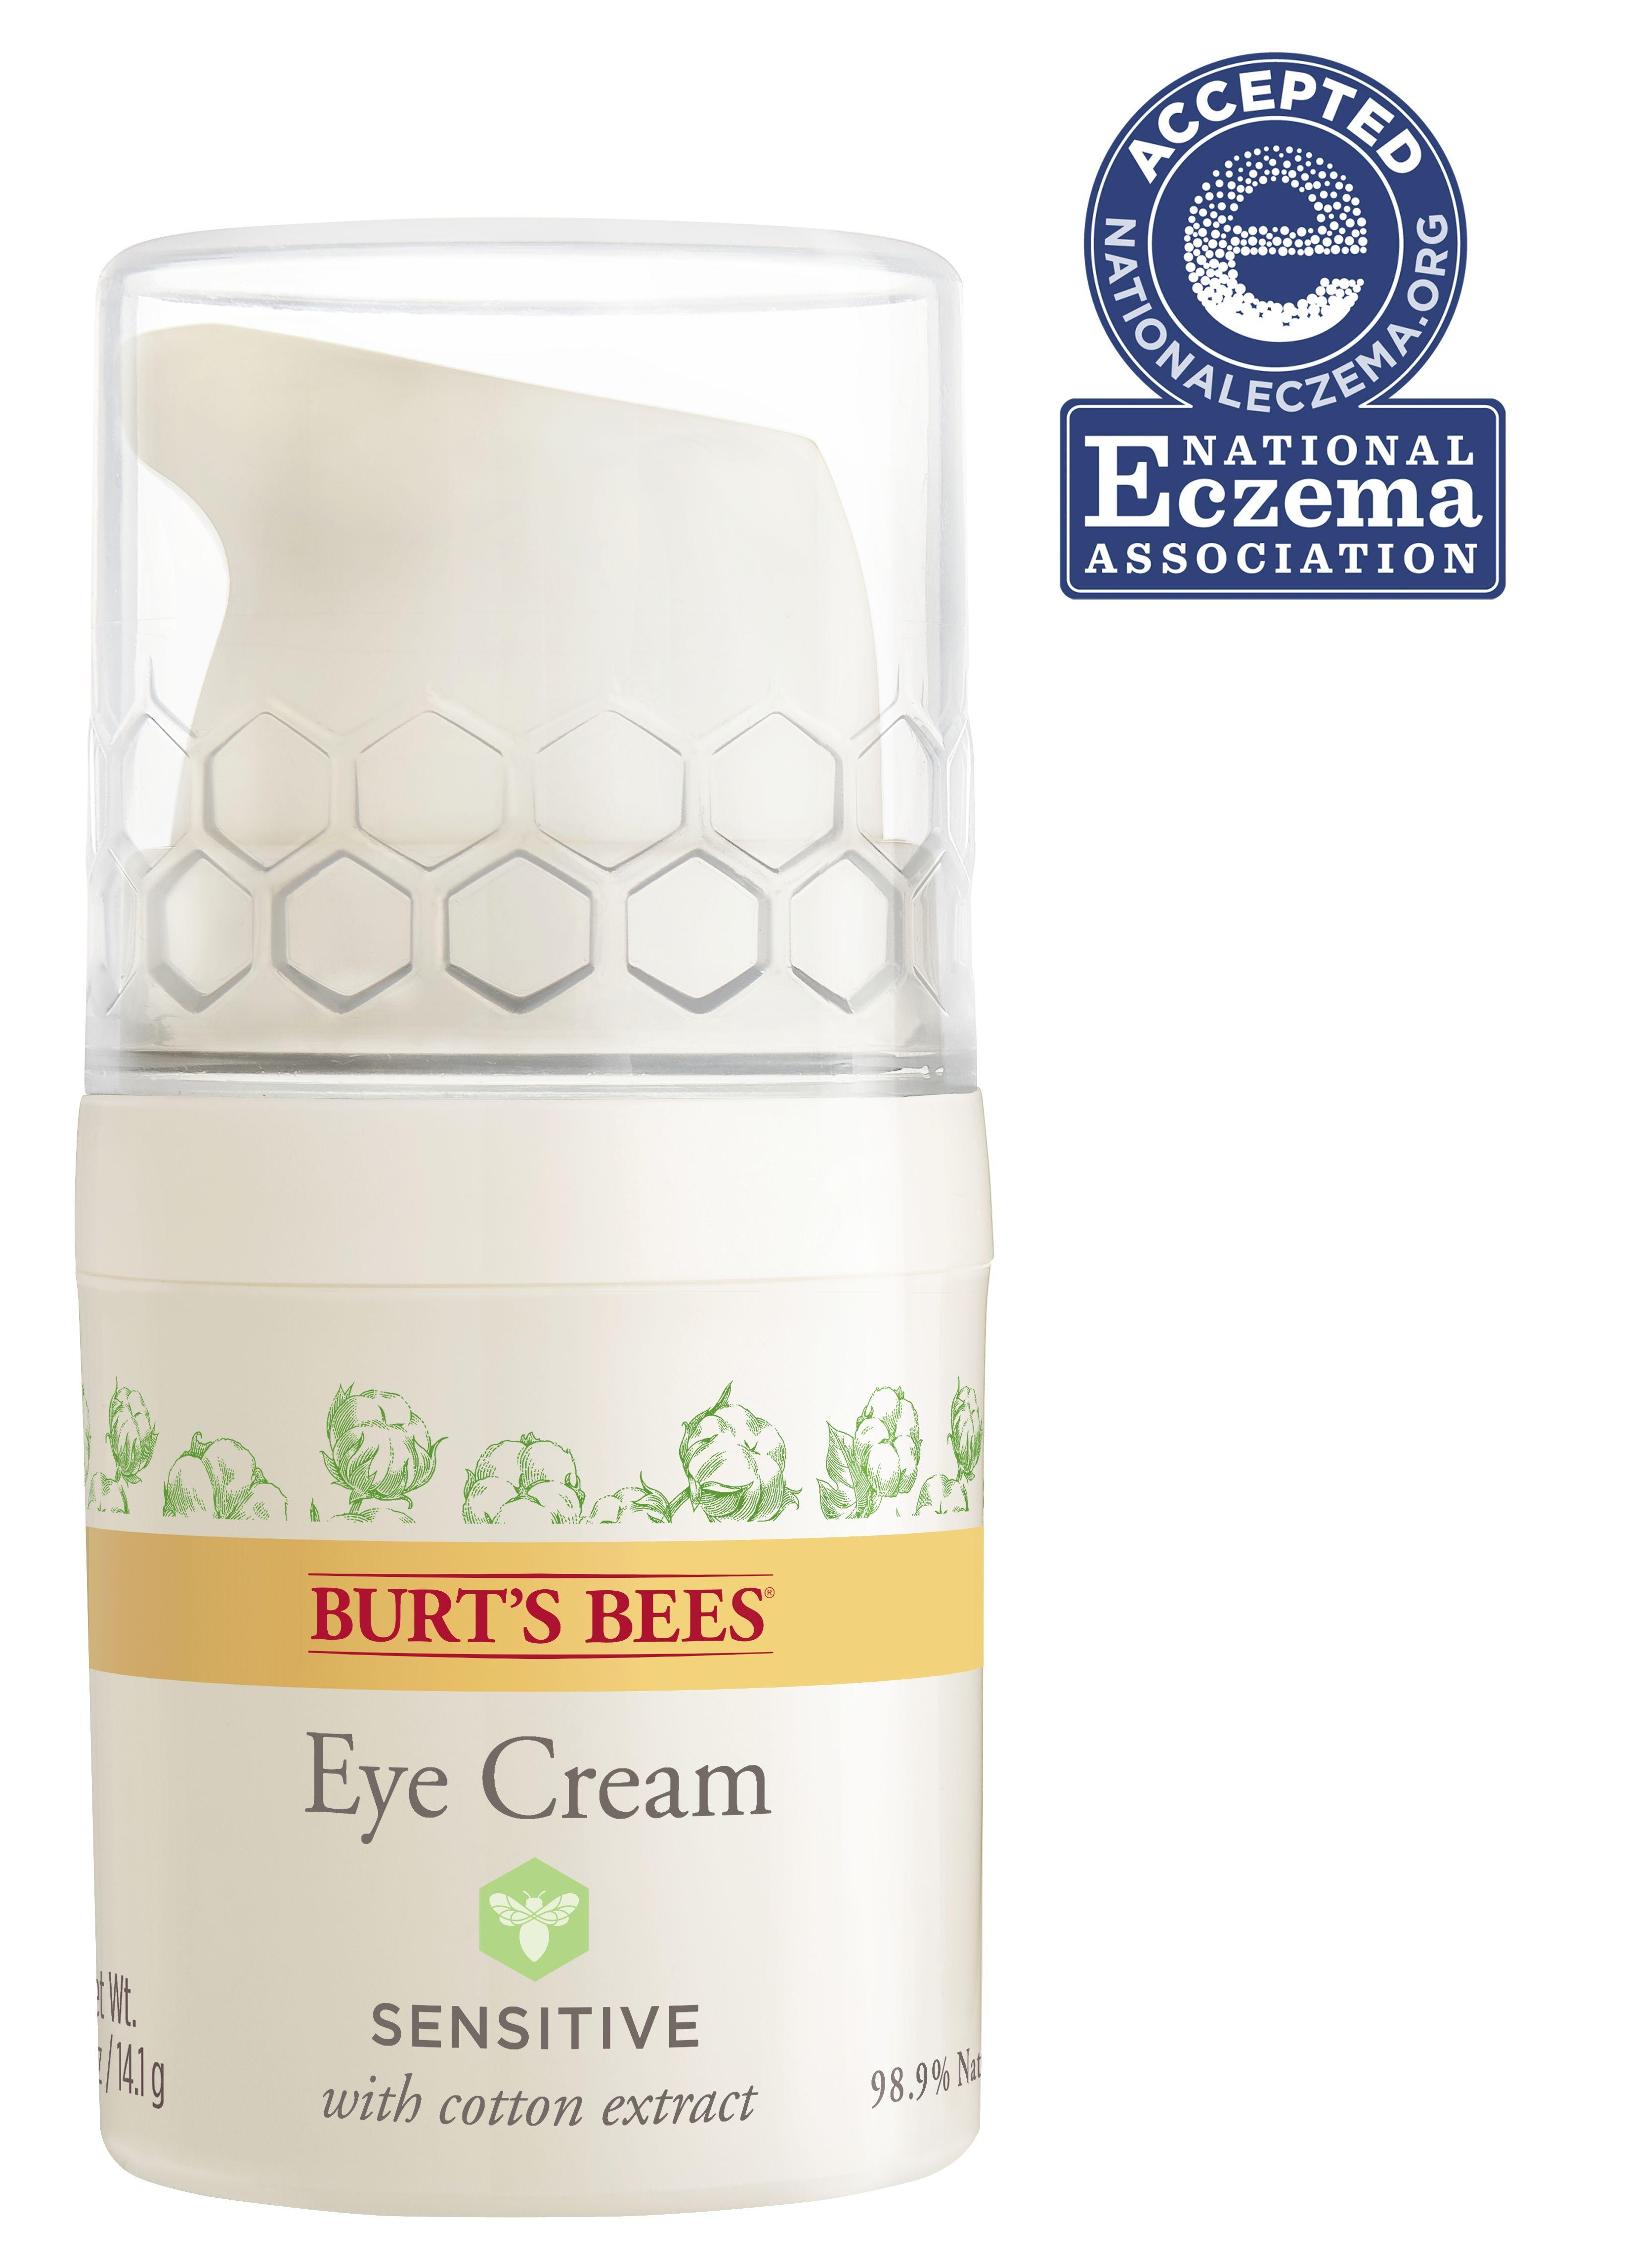 Burt S Bees Eye Cream For Sensitive Skin 0 5 Oz Walmart Com In 2021 Burt S Bees Eye Cream Eye Cream Sensitive Eyes